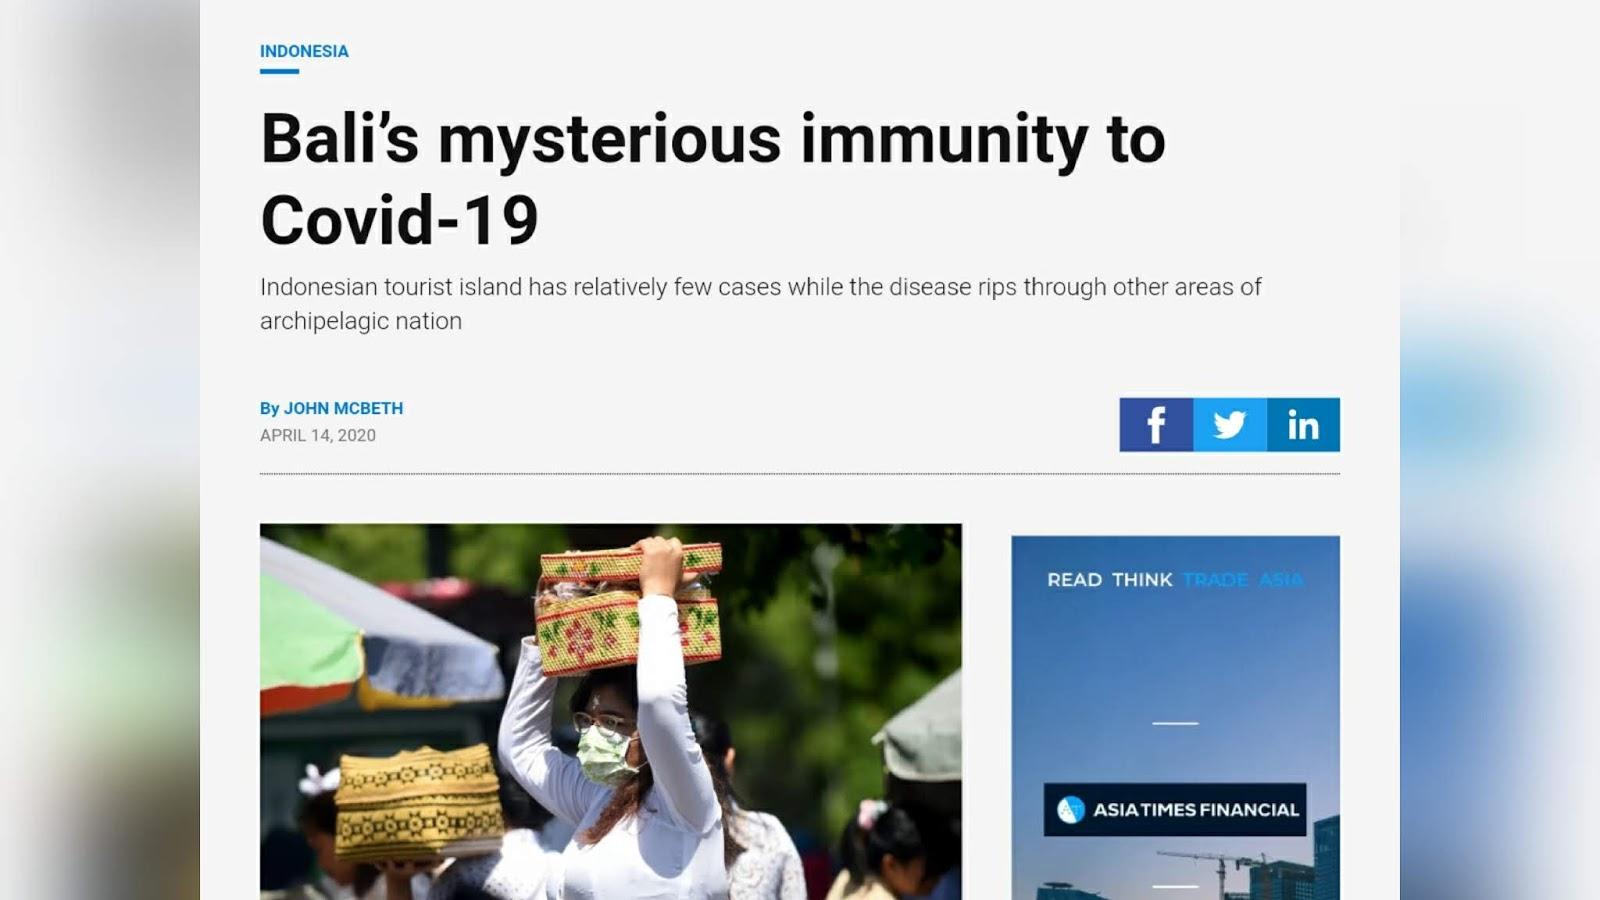 HEBOH! Media Asing Soroti Kekebalan Misterius Warga Bali dari Virus Corona